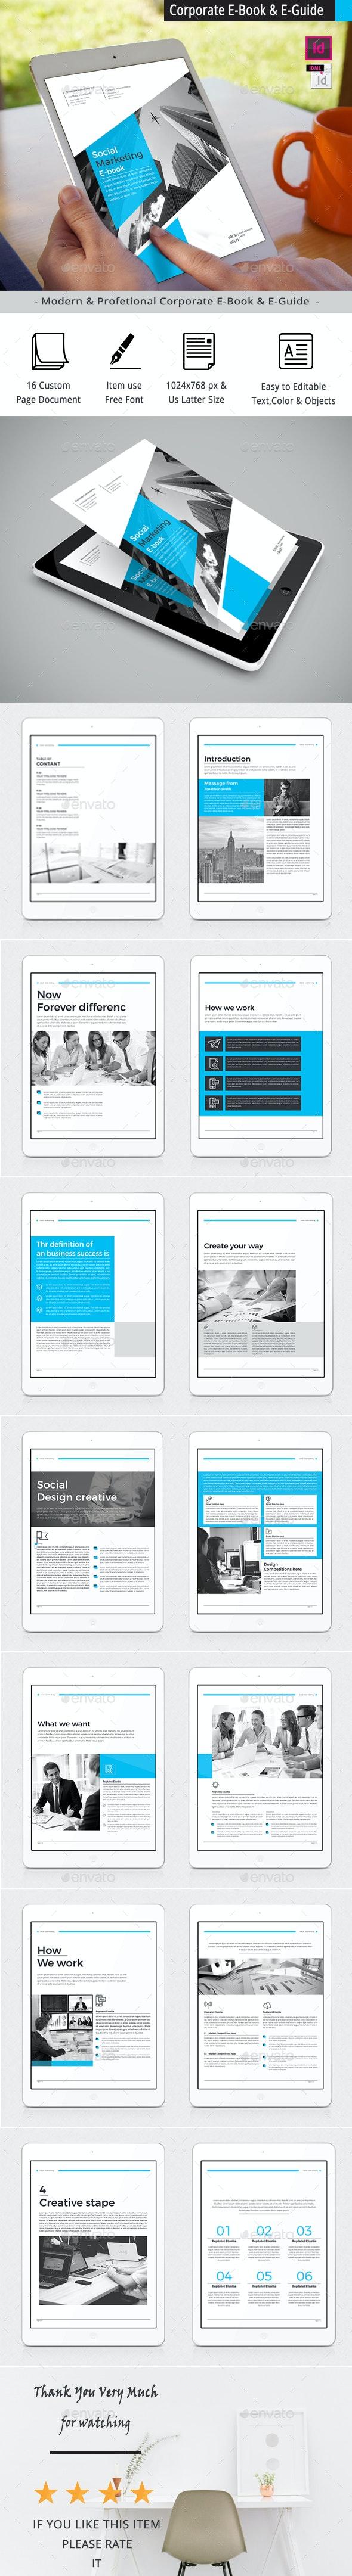 Corporate E-Book & E-Guide - Digital Books ePublishing